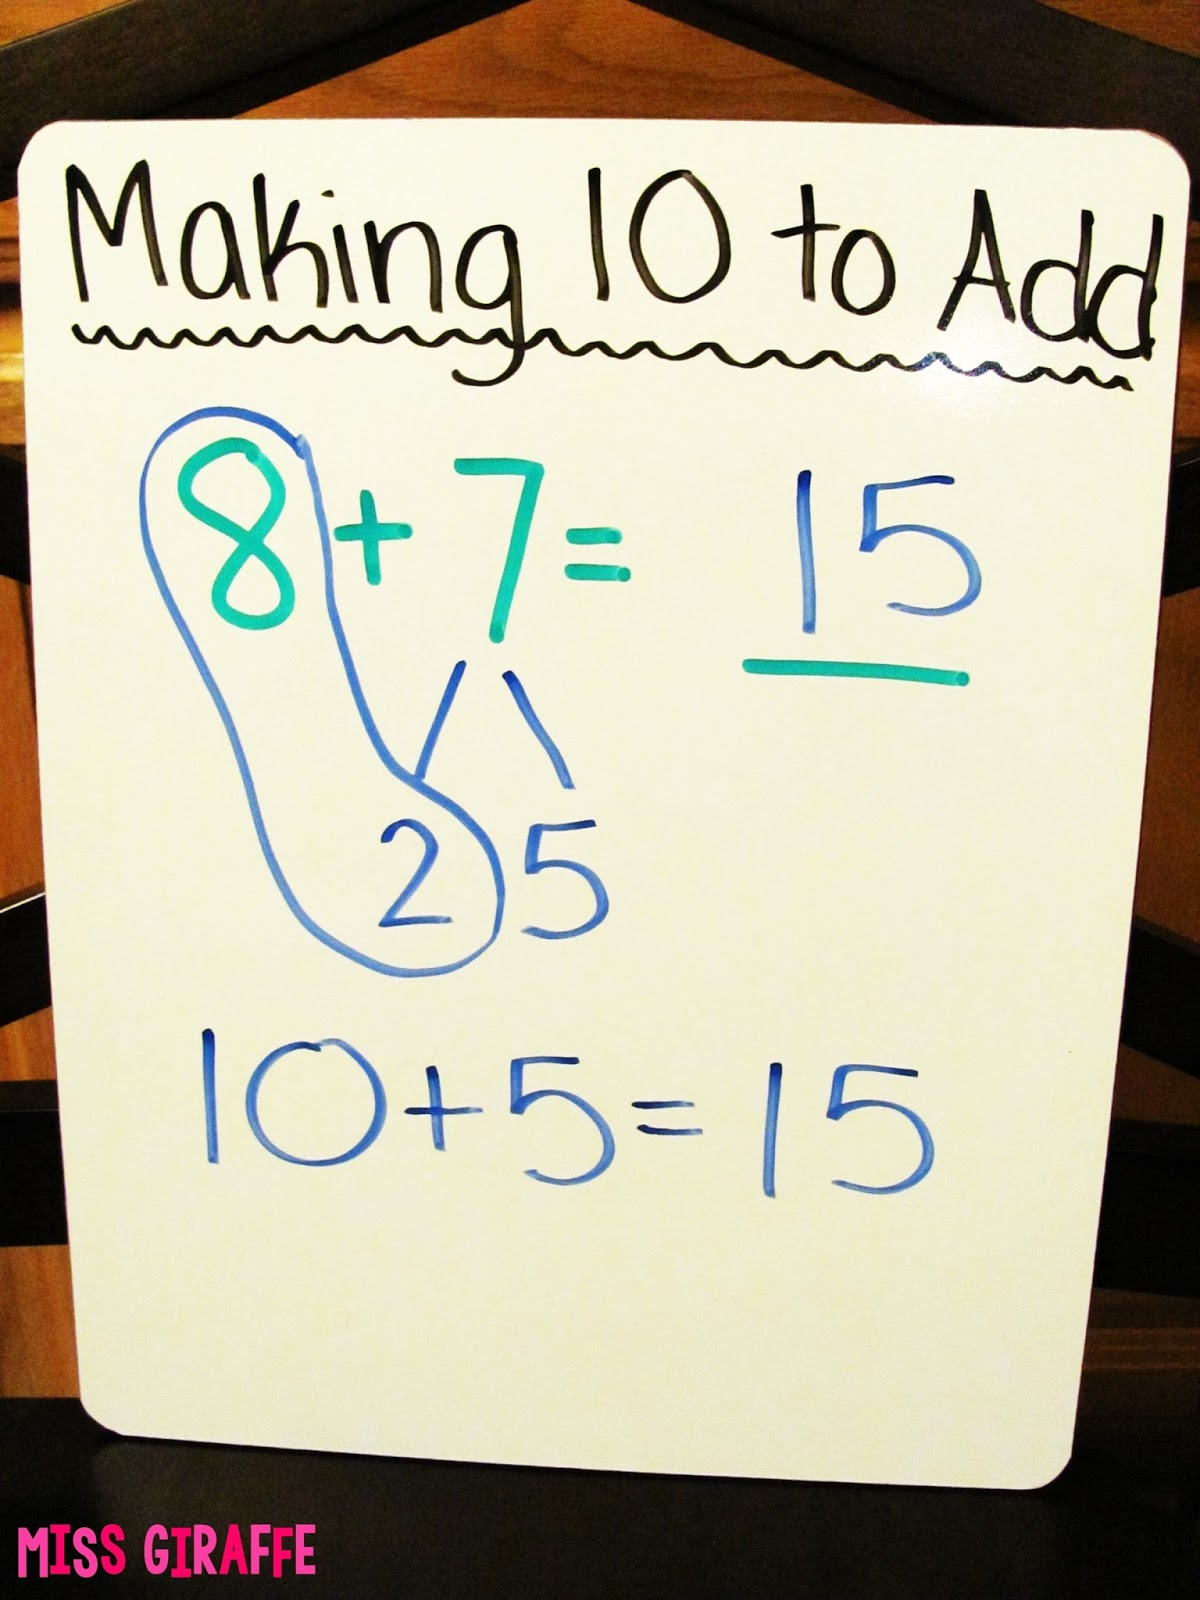 hight resolution of Miss Giraffe's Class: Making a 10 to Add